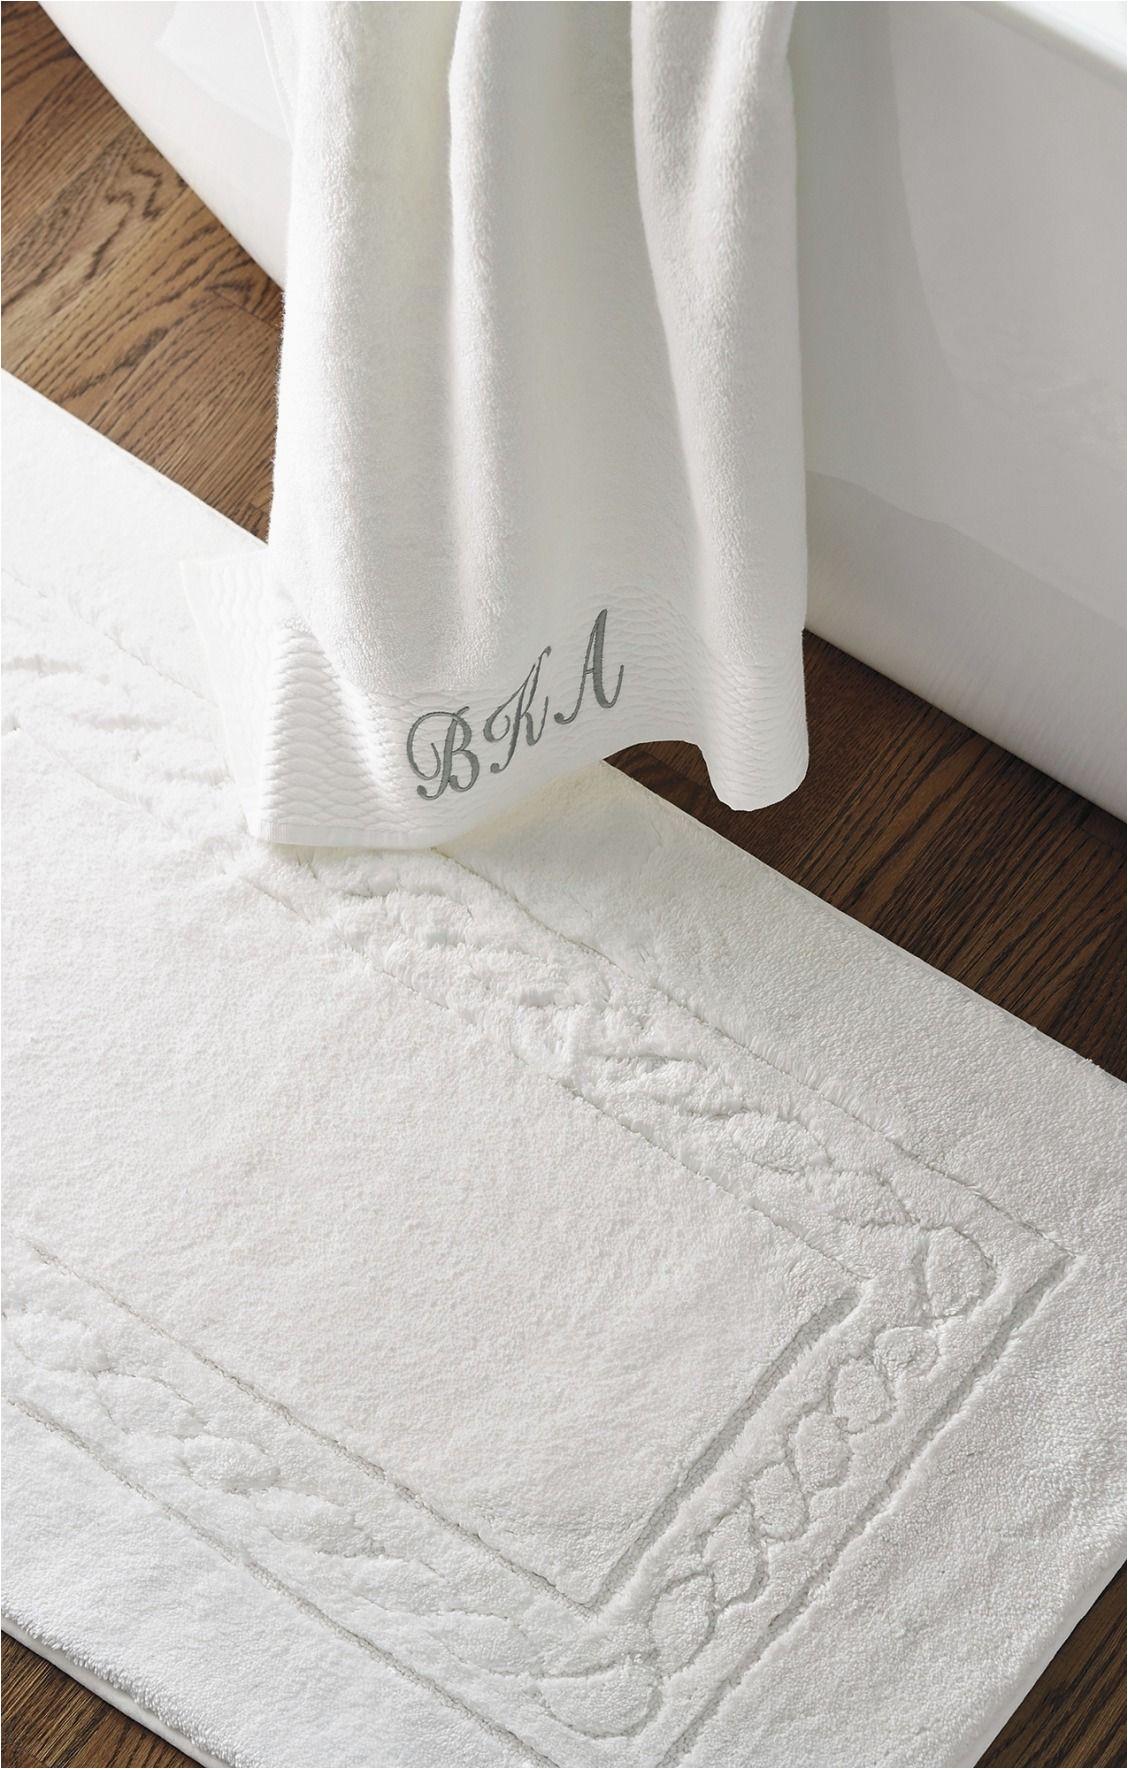 White Bath Rugs Cotton Egyptian Cotton Skid Resistant Bath Rug